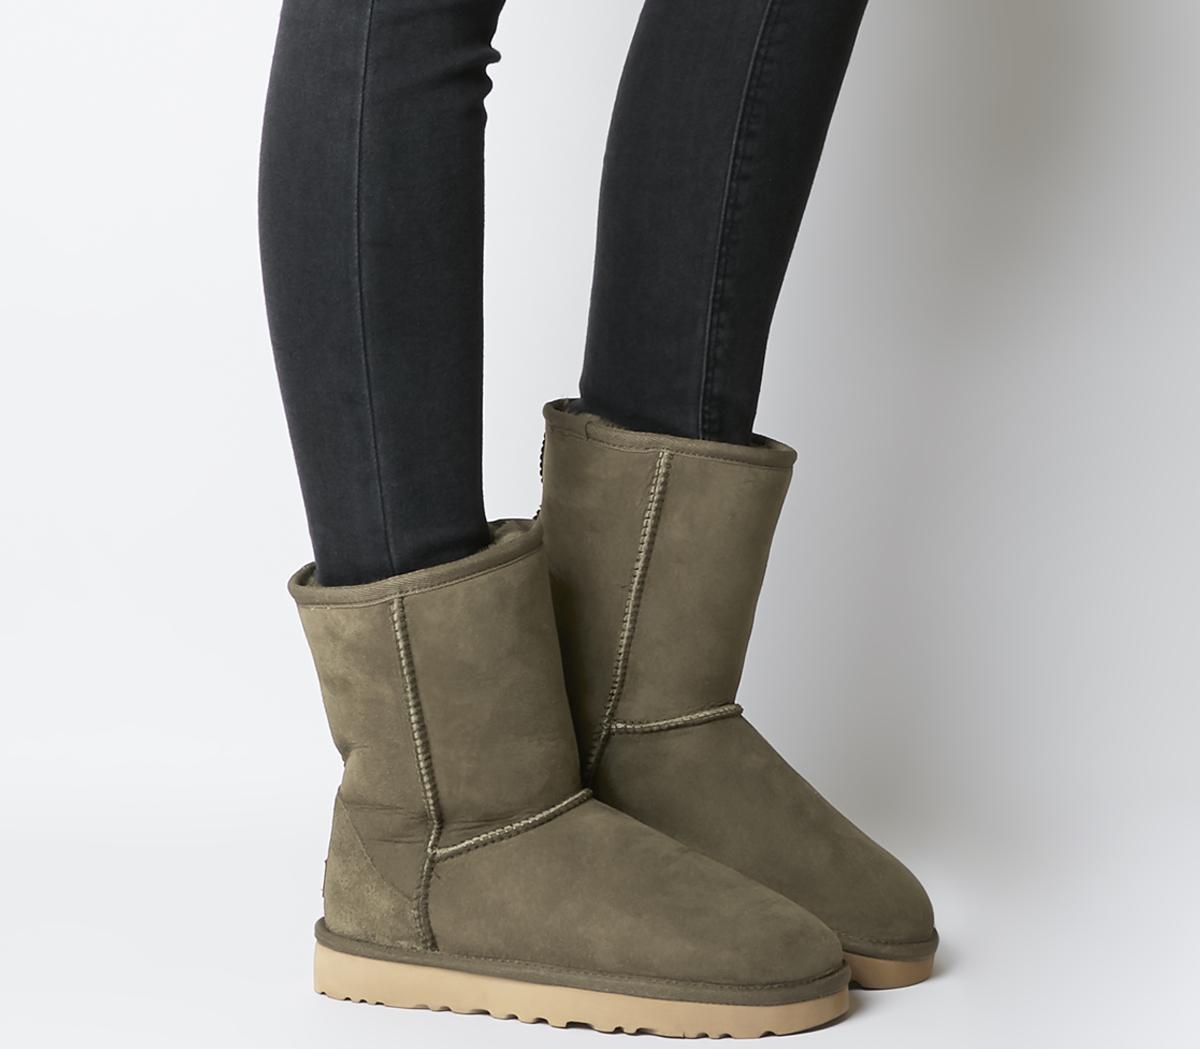 nya stilar stort urval skridsko skor UGG Classic Short II Boots Eucalyptus Spray - Ankle Boots